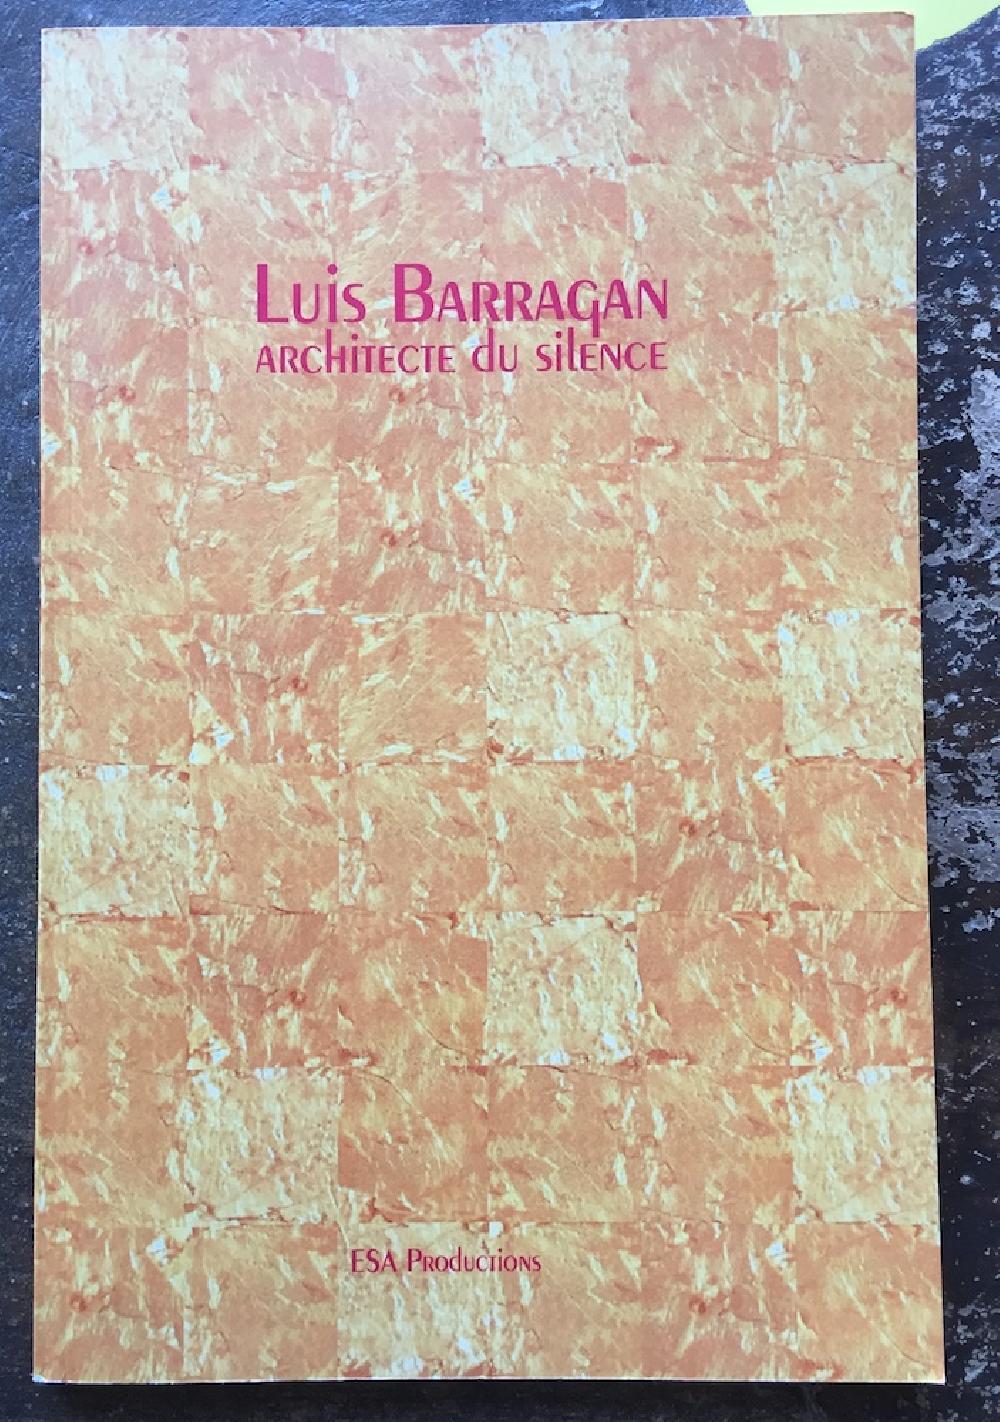 Luis Barragan architecte du silence